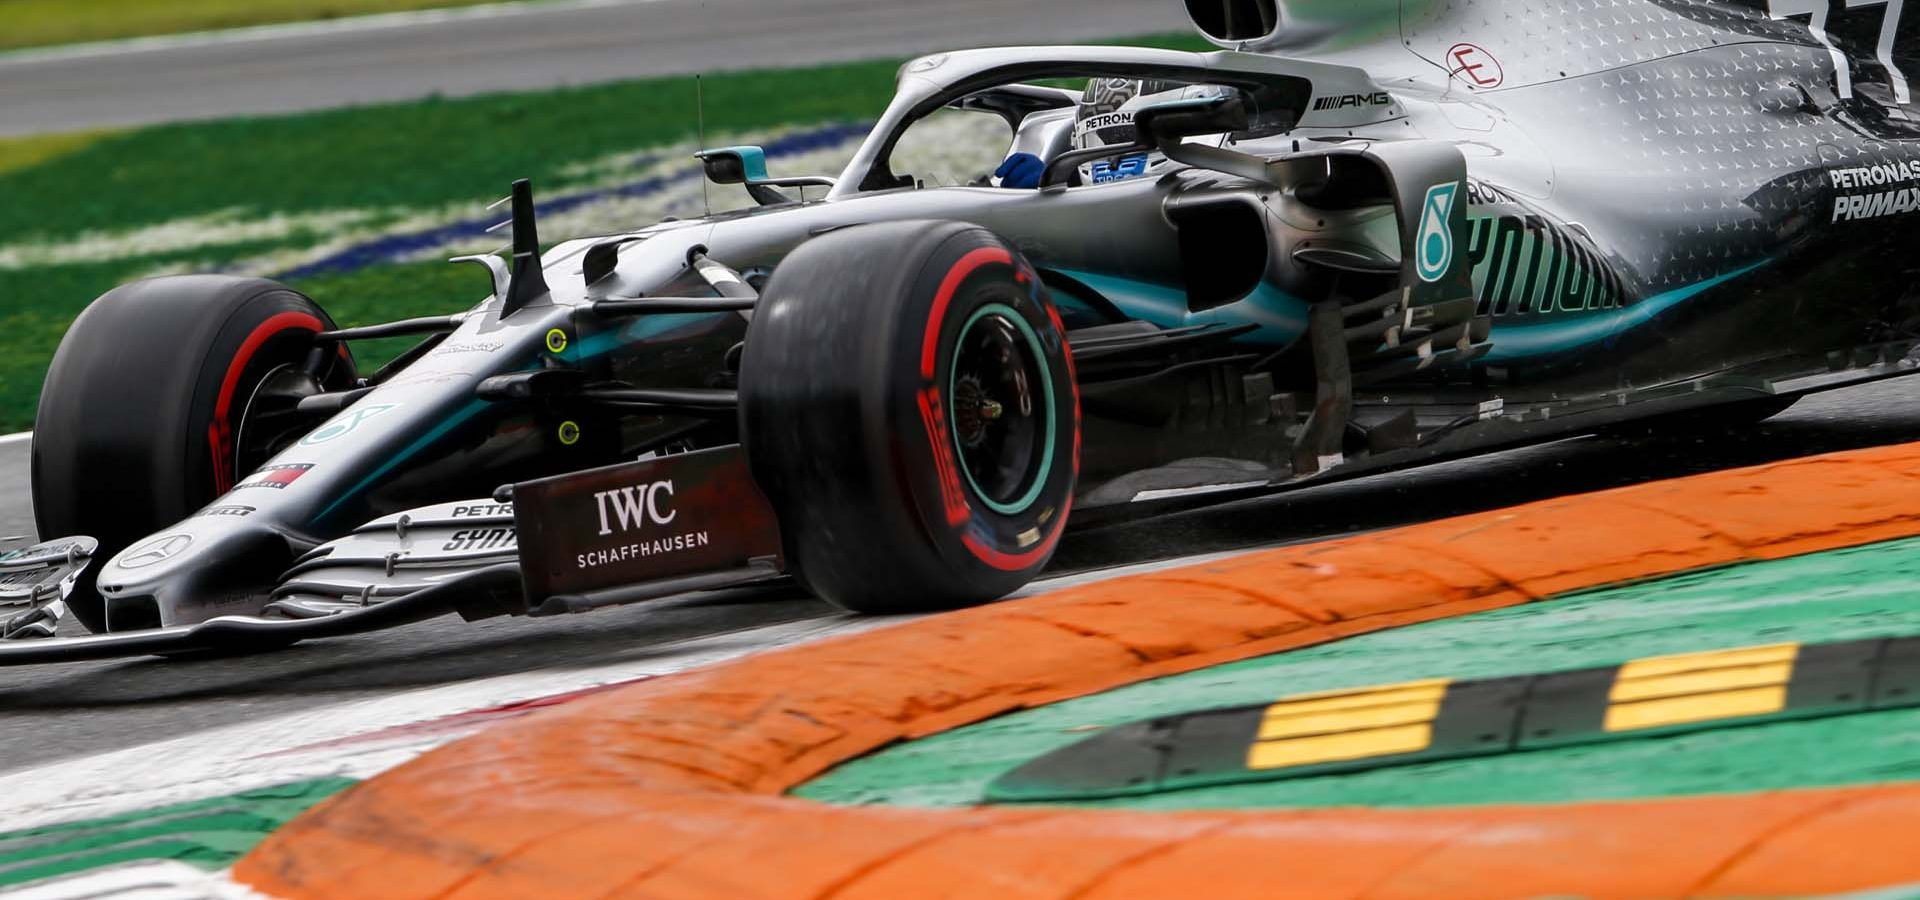 2019 Italian Grand Prix, Friday - Wolfgang Wilhelm Valtteri Bottas Mercedes